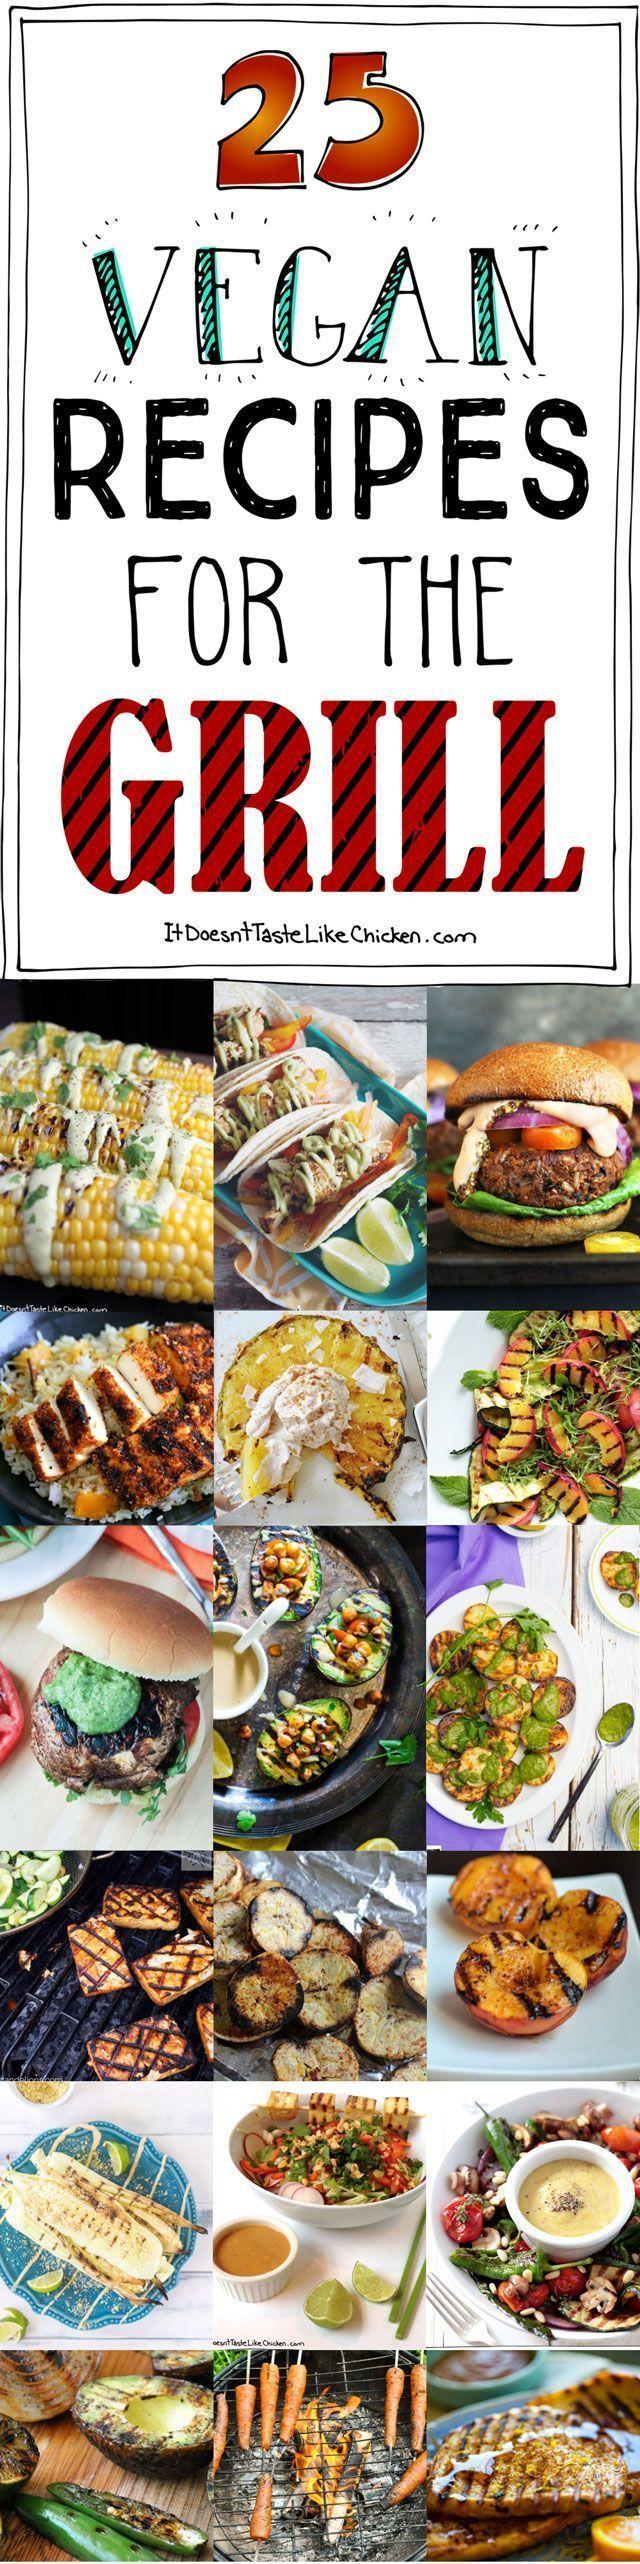 25 Vegan Recipes For The Grill A Very Vegan Summer Vegan